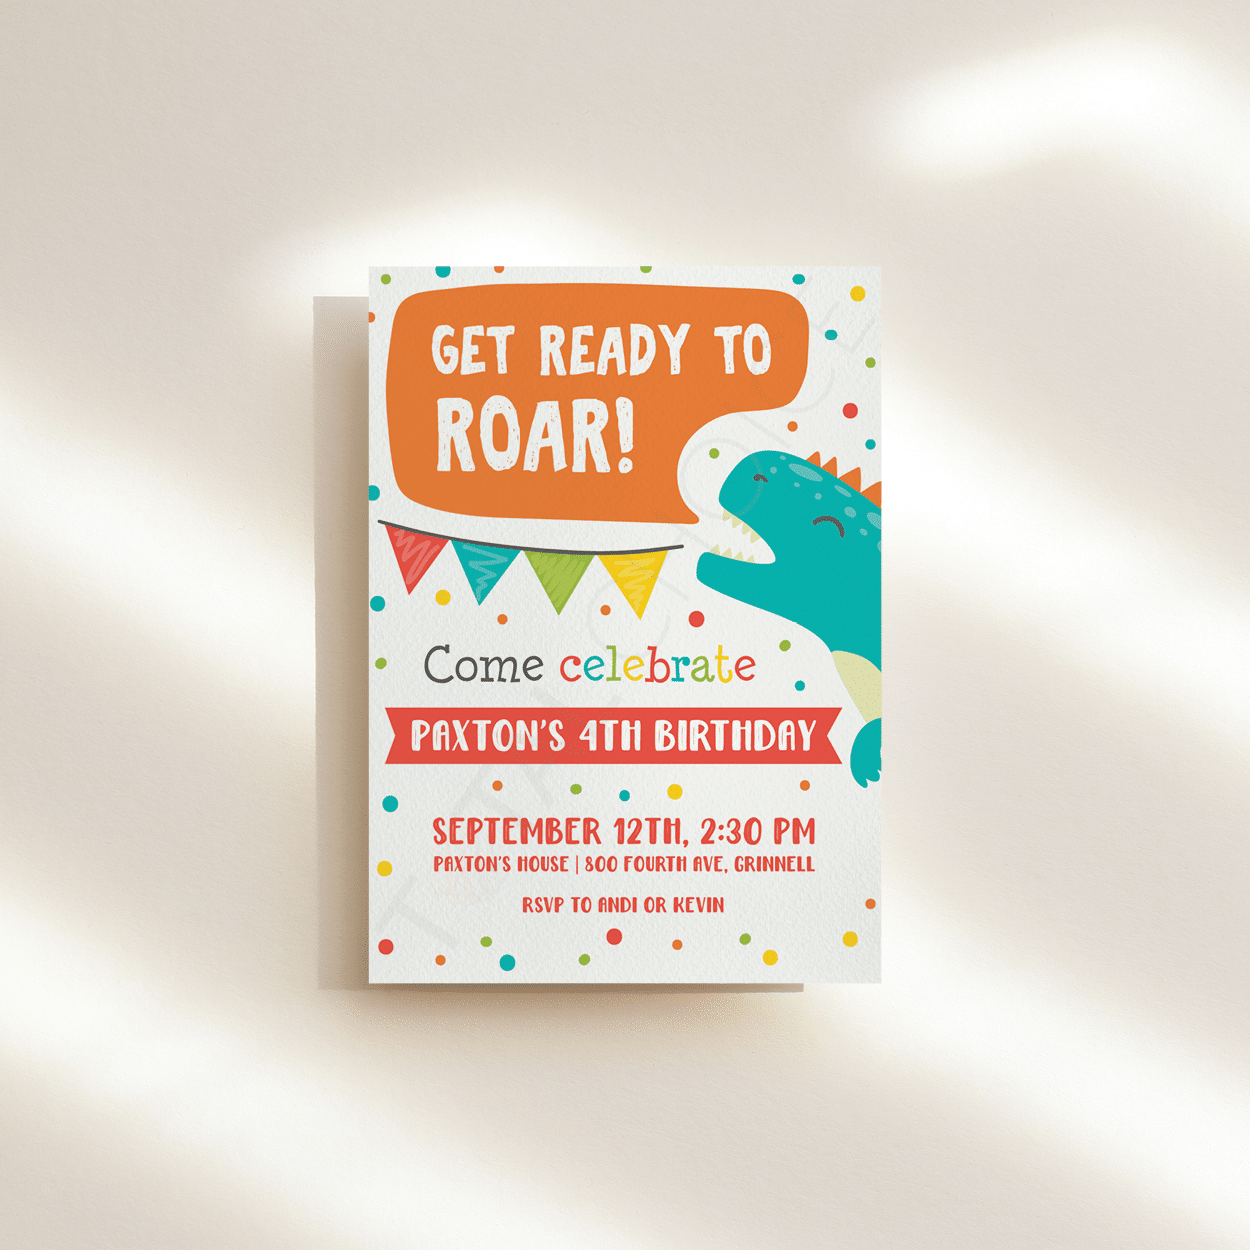 Get Ready to Roar Birthday Invitation